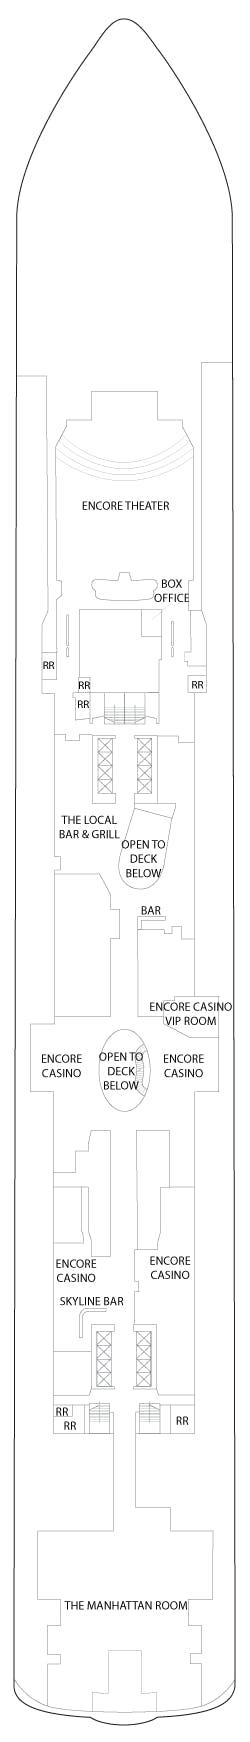 Deck Seven